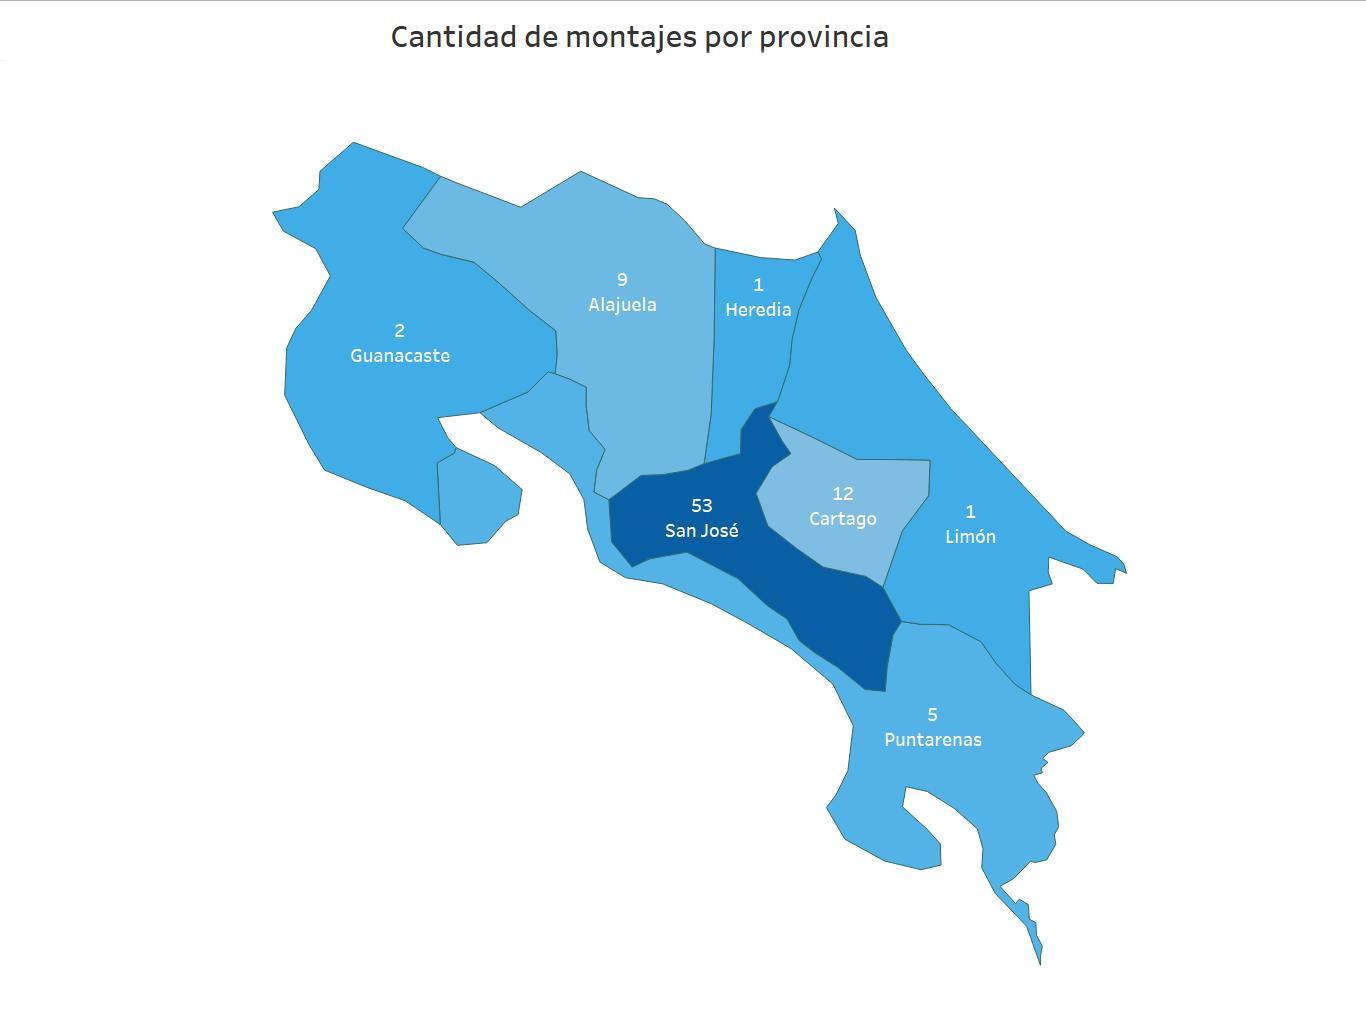 Montajes por provincia